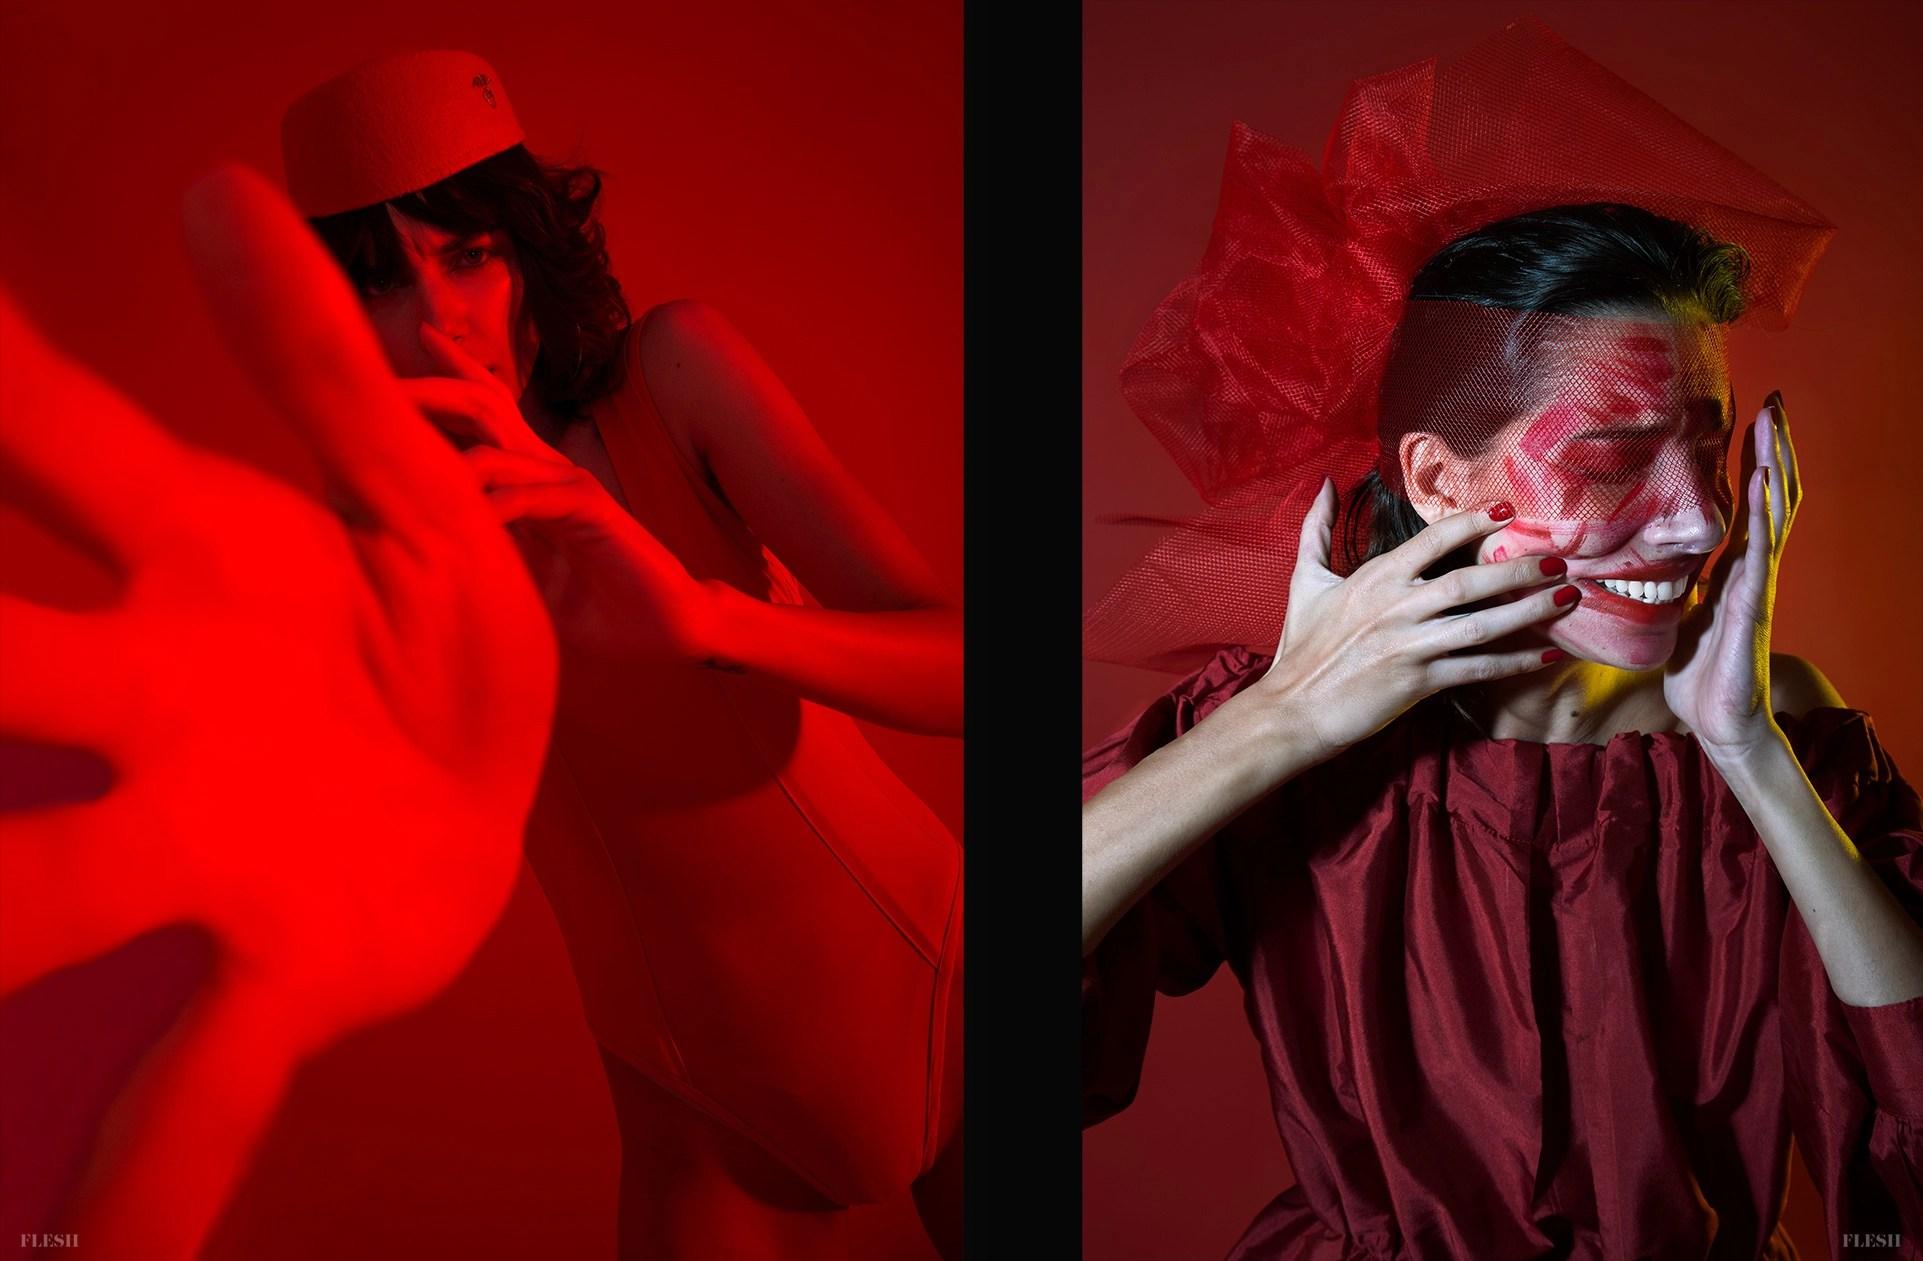 Redrum PHOTO Nigorette STYLING Ness De Luna + Criss Sauza